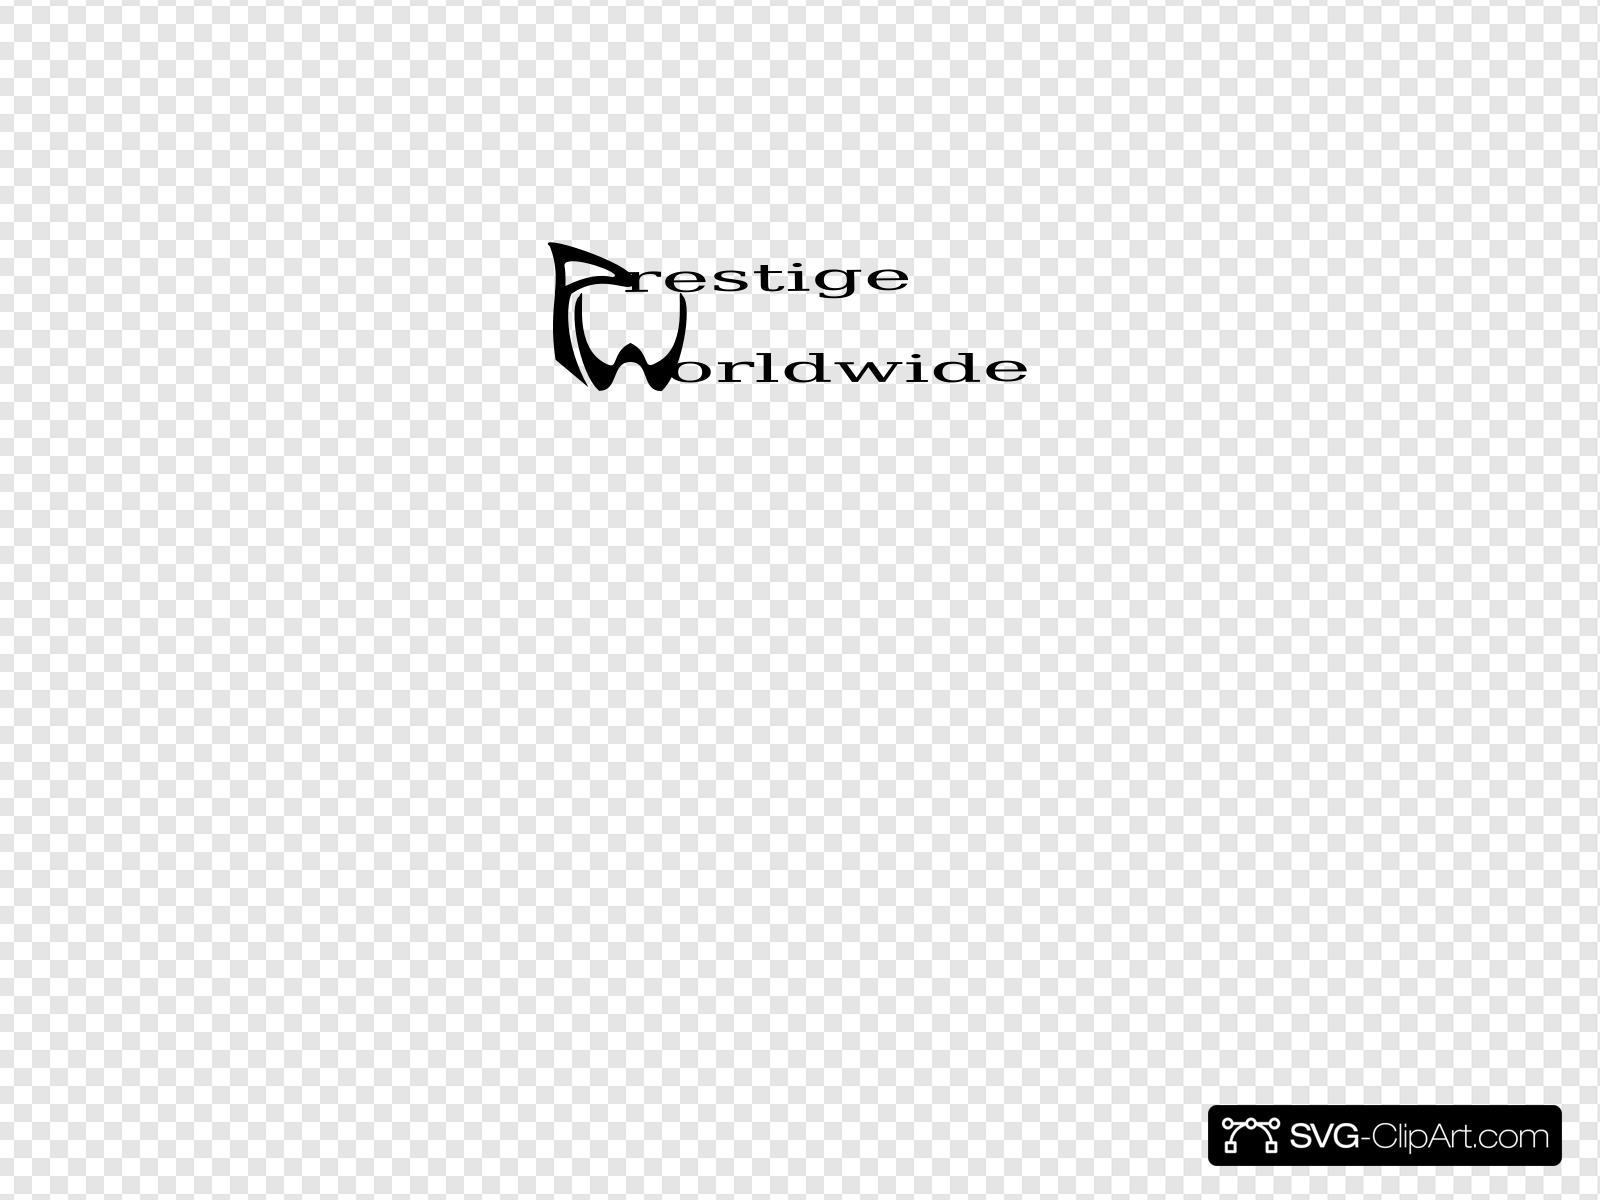 Prestige logo clipart svg royalty free stock Prestige Worldwide Logo Clip art, Icon and SVG - SVG Clipart svg royalty free stock